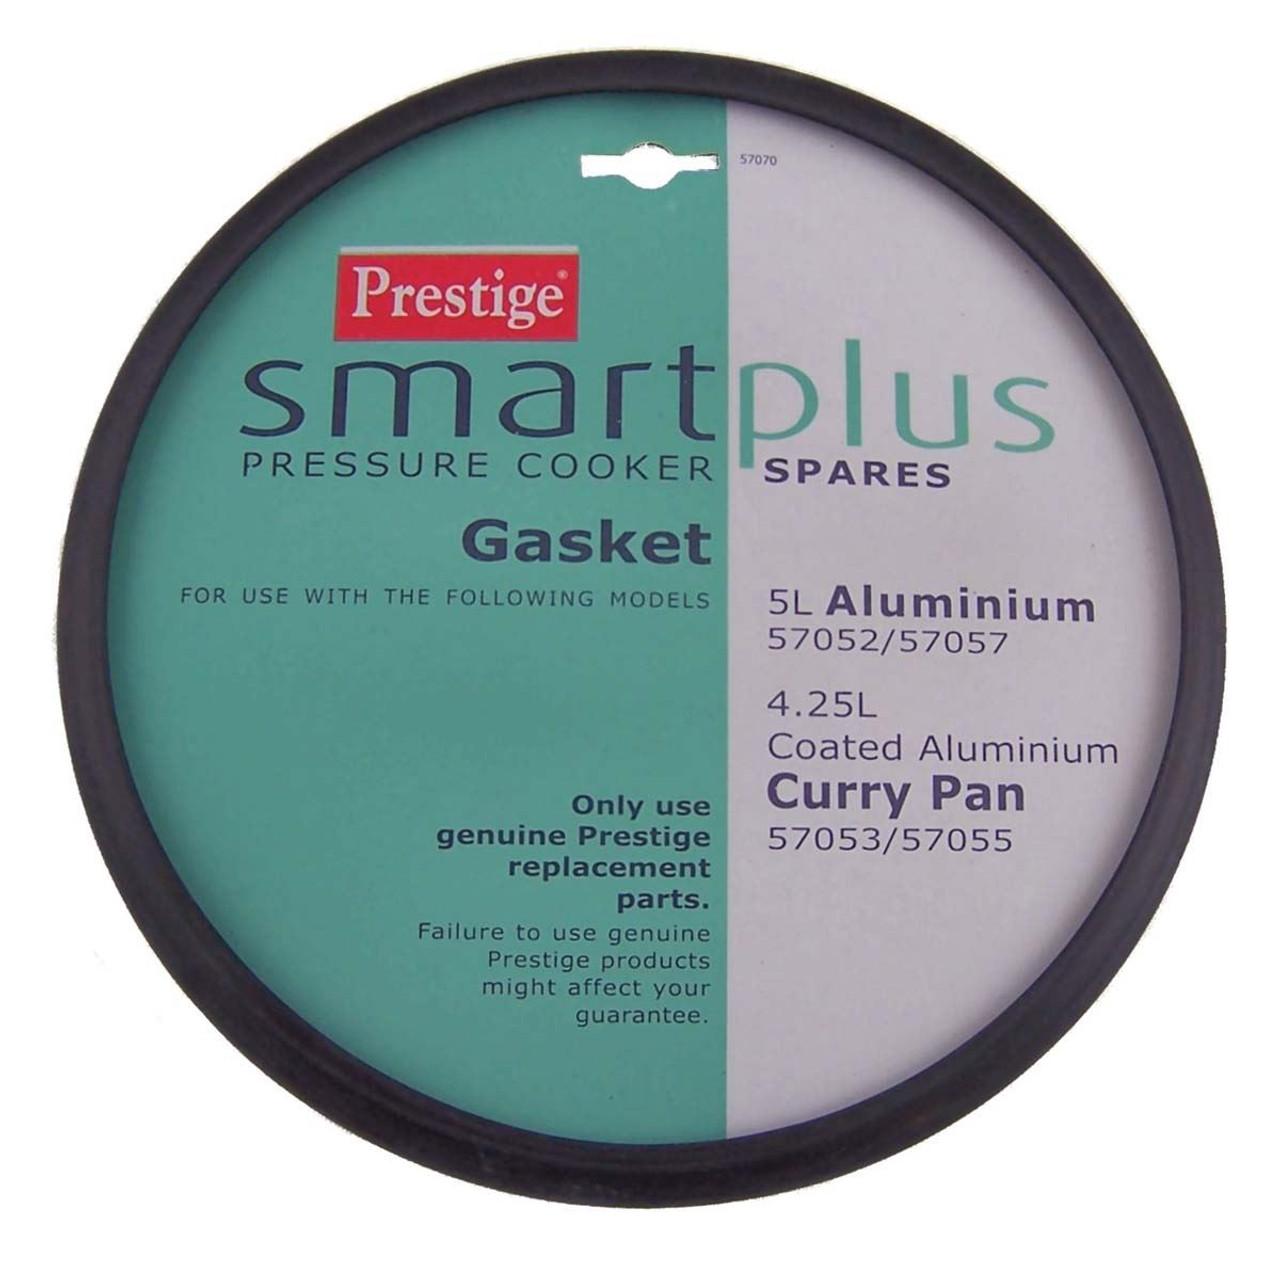 Prestige Smartplus Pressure Cooker Gasket